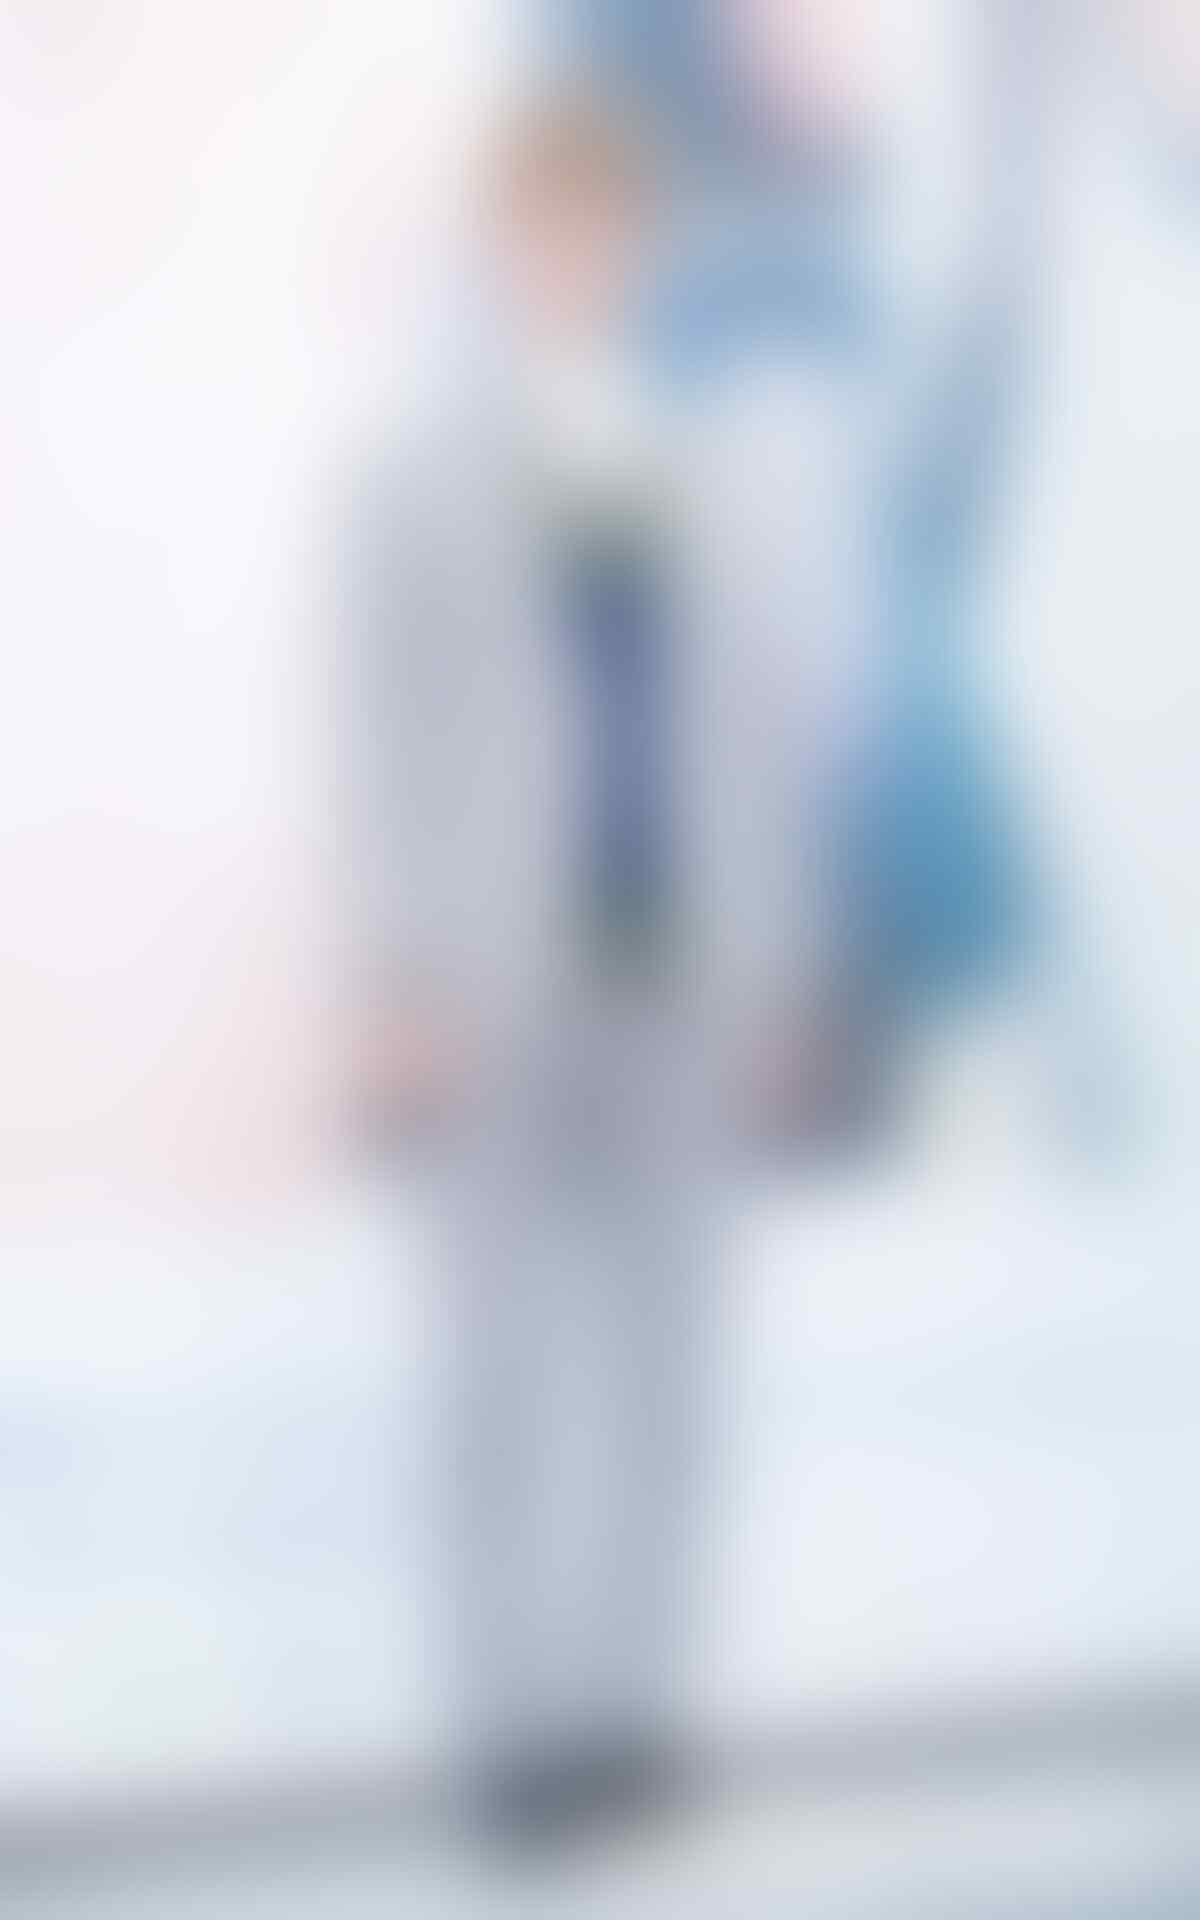 10 Gaya Outfit Minho Shinee, dari Kasual Hingga Formal